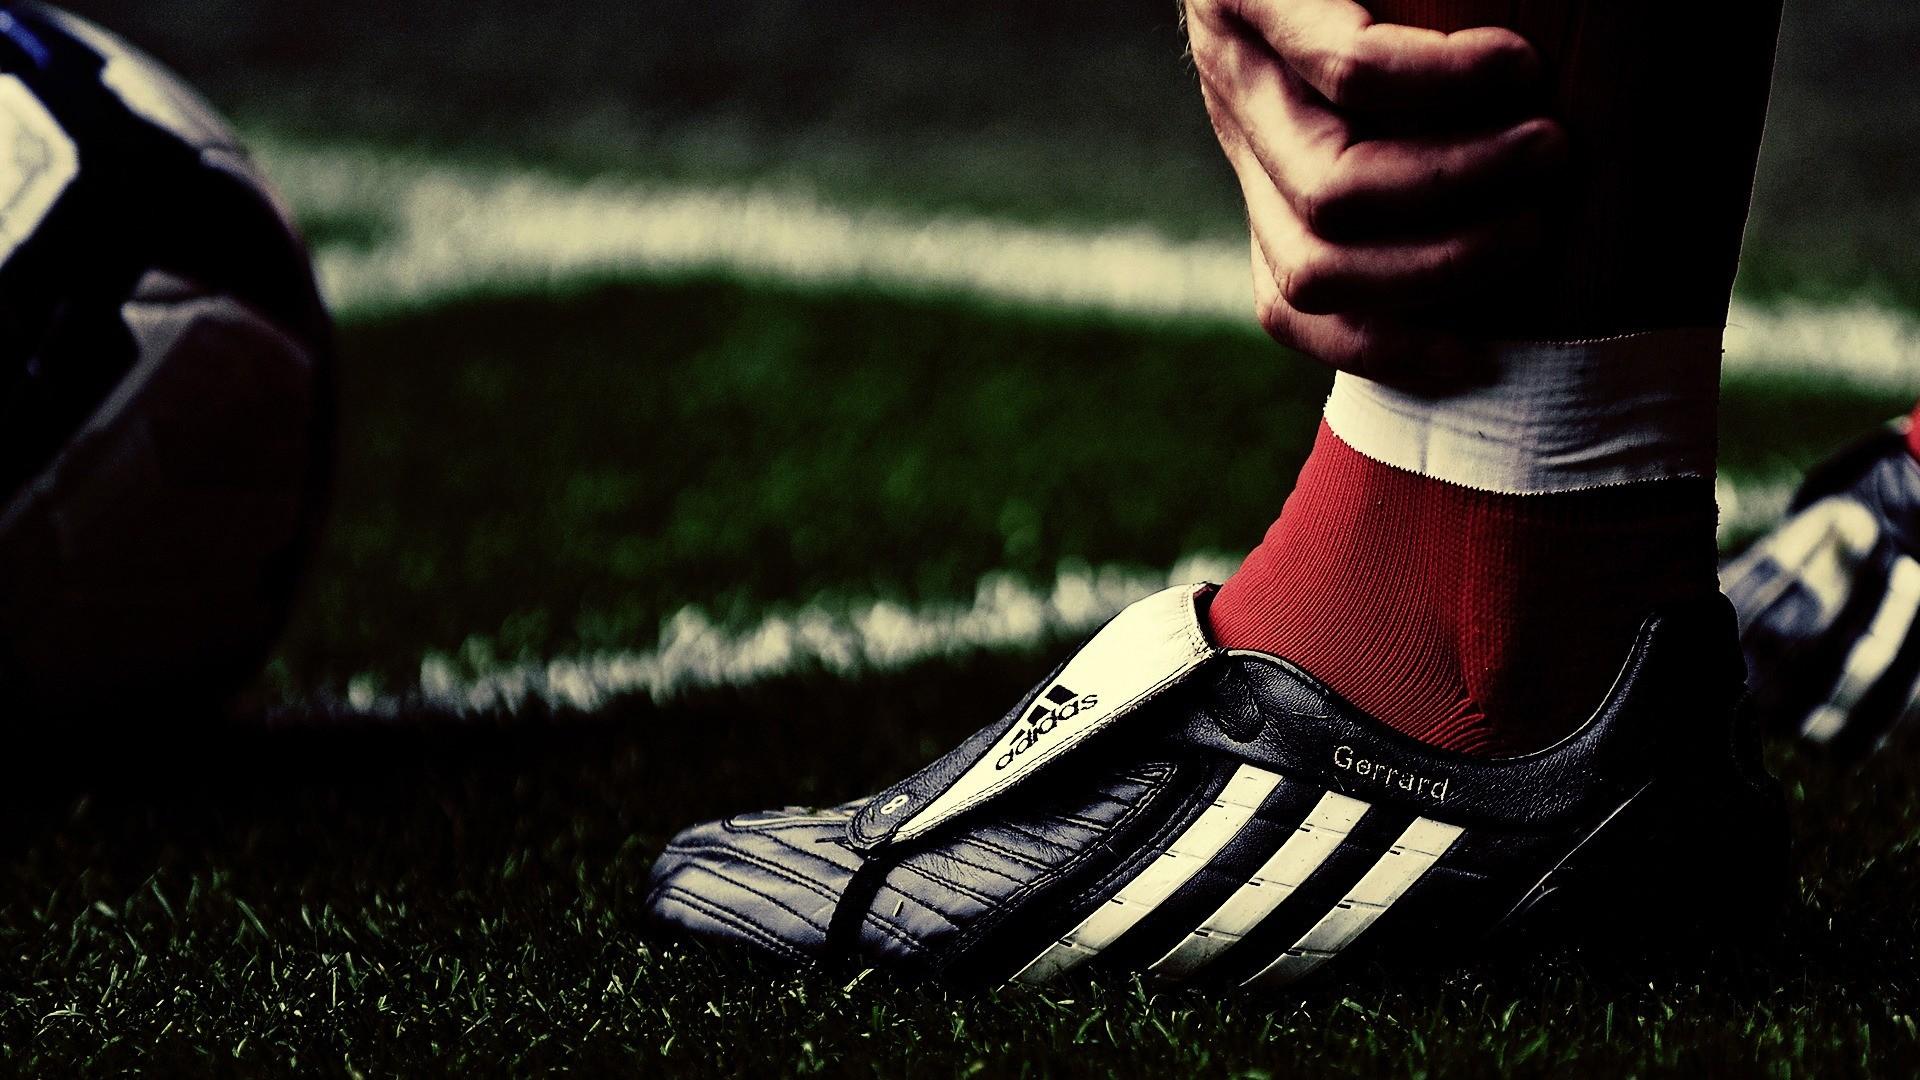 Adidas Soccer Shoe 1080p HD Sports Wallpaper